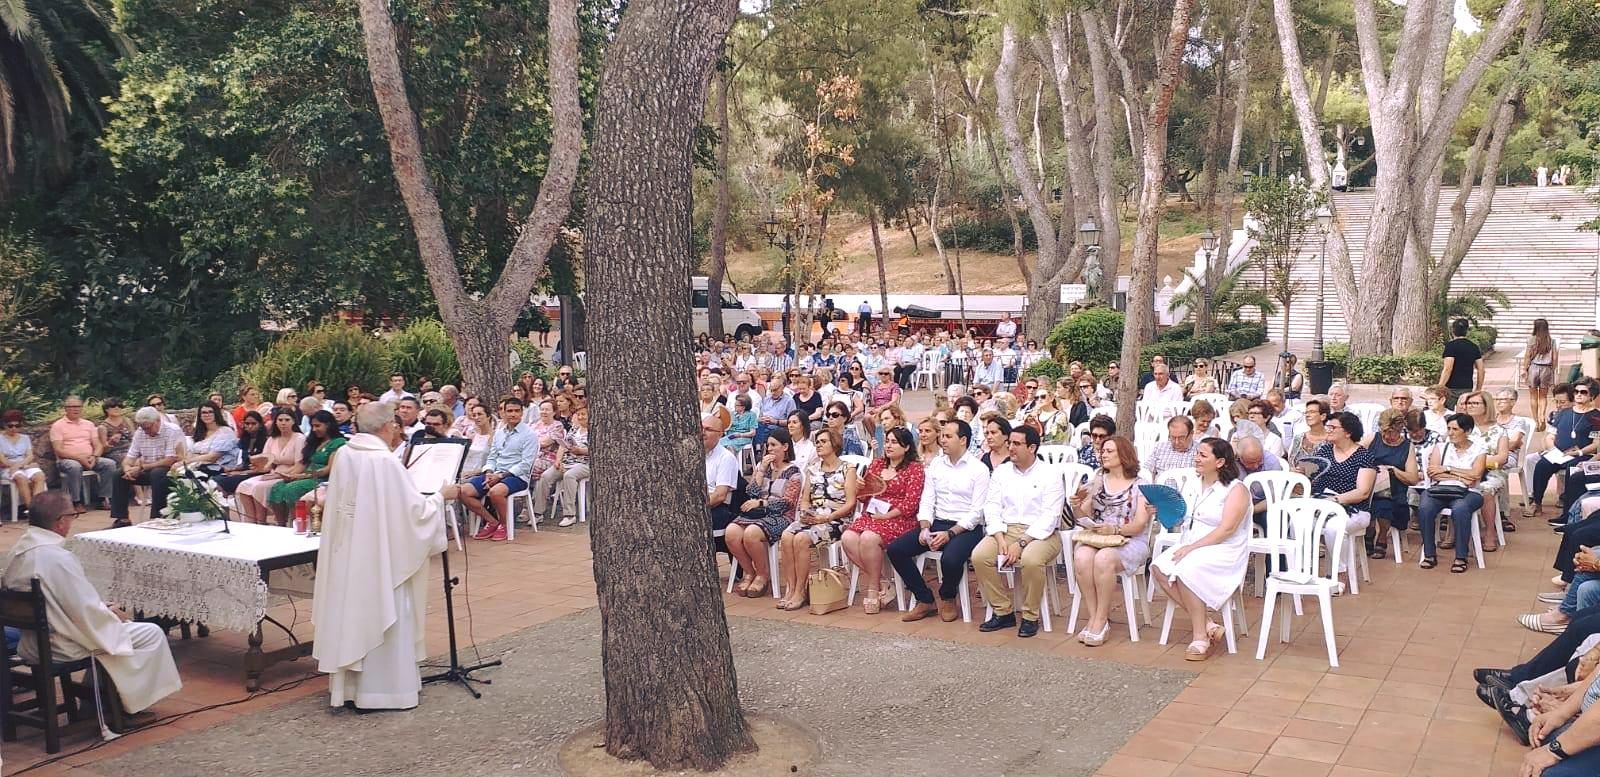 La Festa del Termet da inicio a la temporada estival.